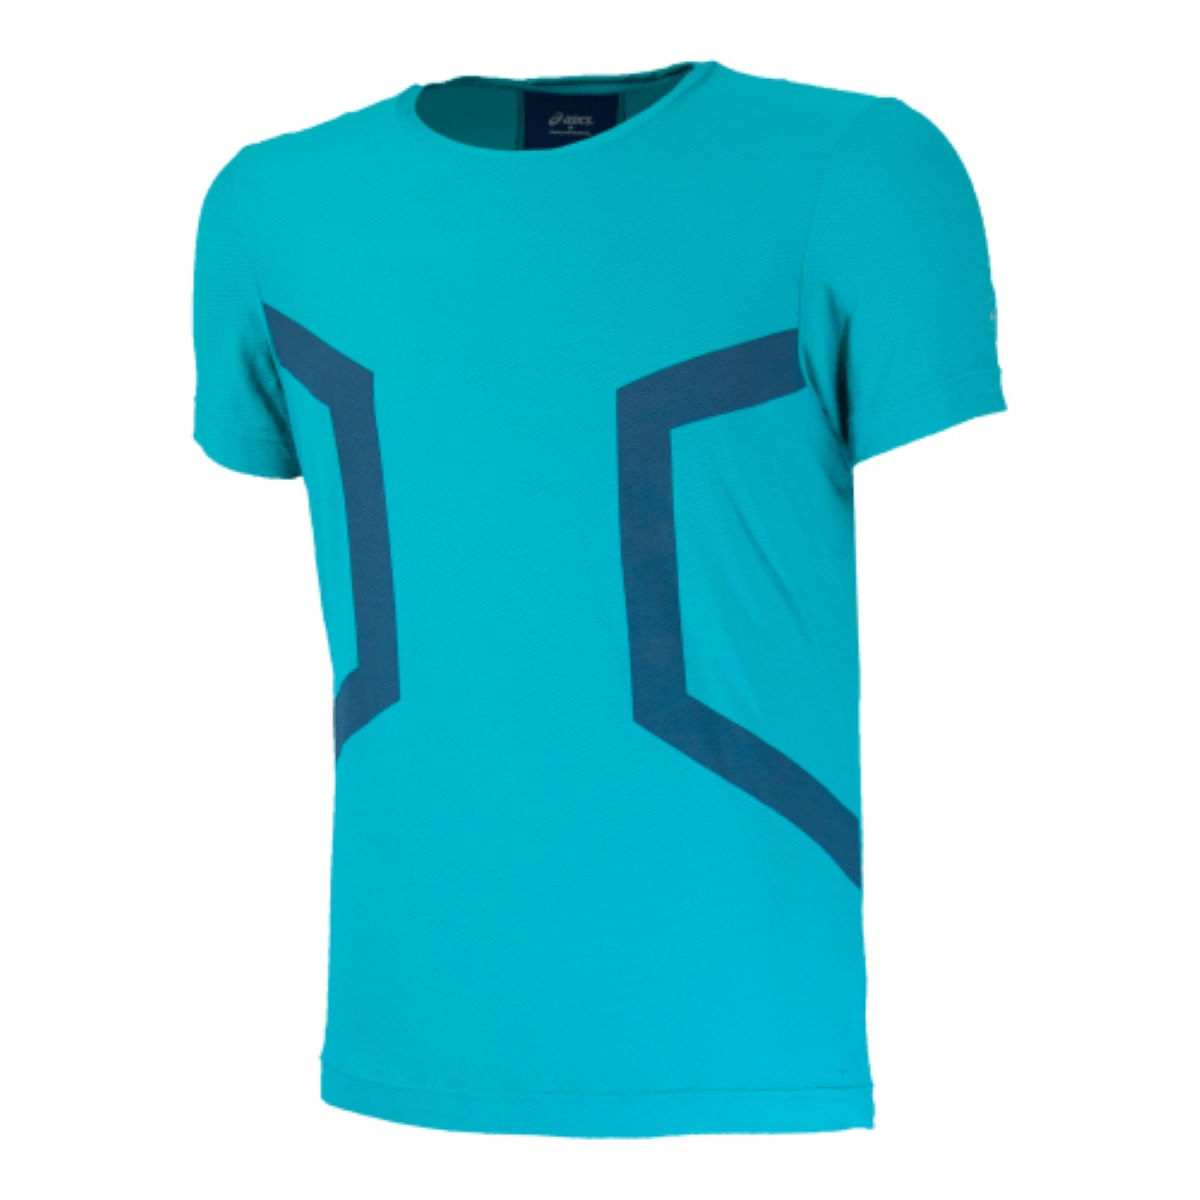 Camiseta-Asics-Training-Overhead-Crew---Masculino---Azul